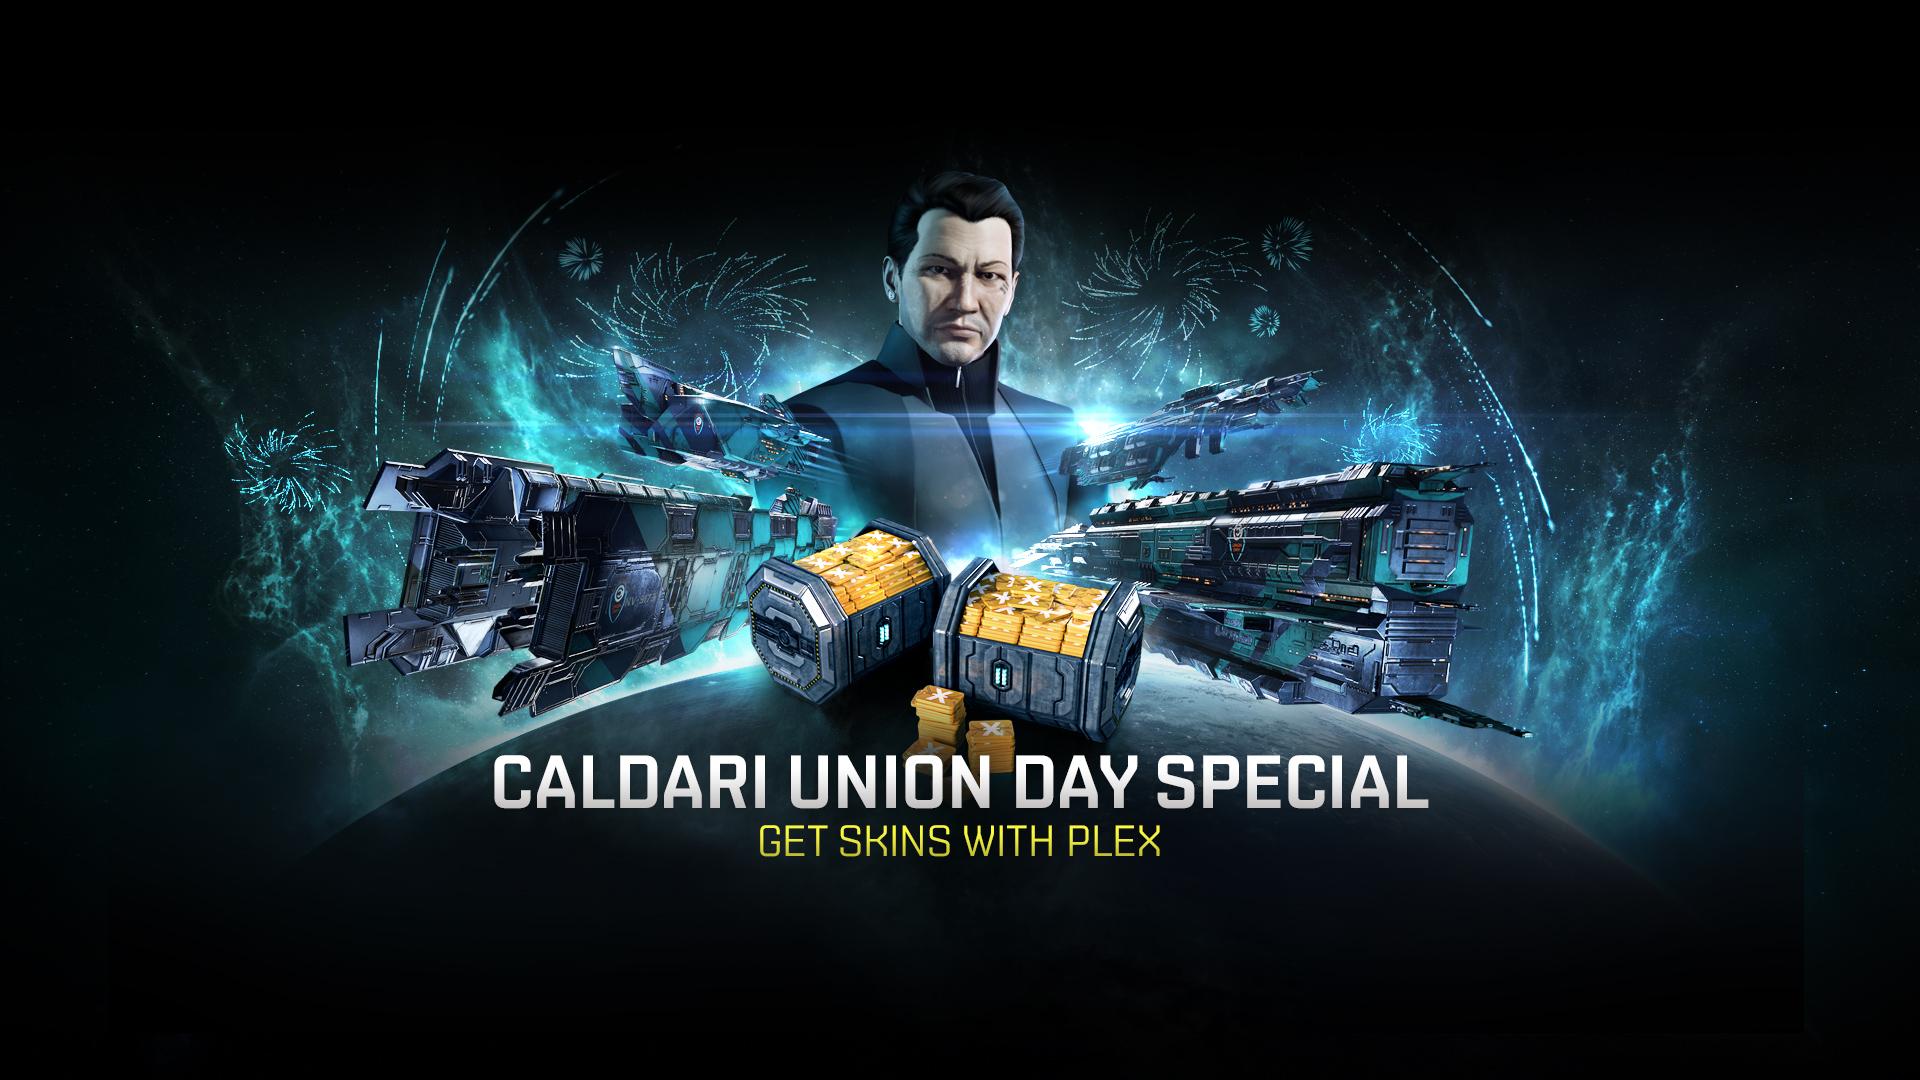 CaldariUnionDayOffer_EN